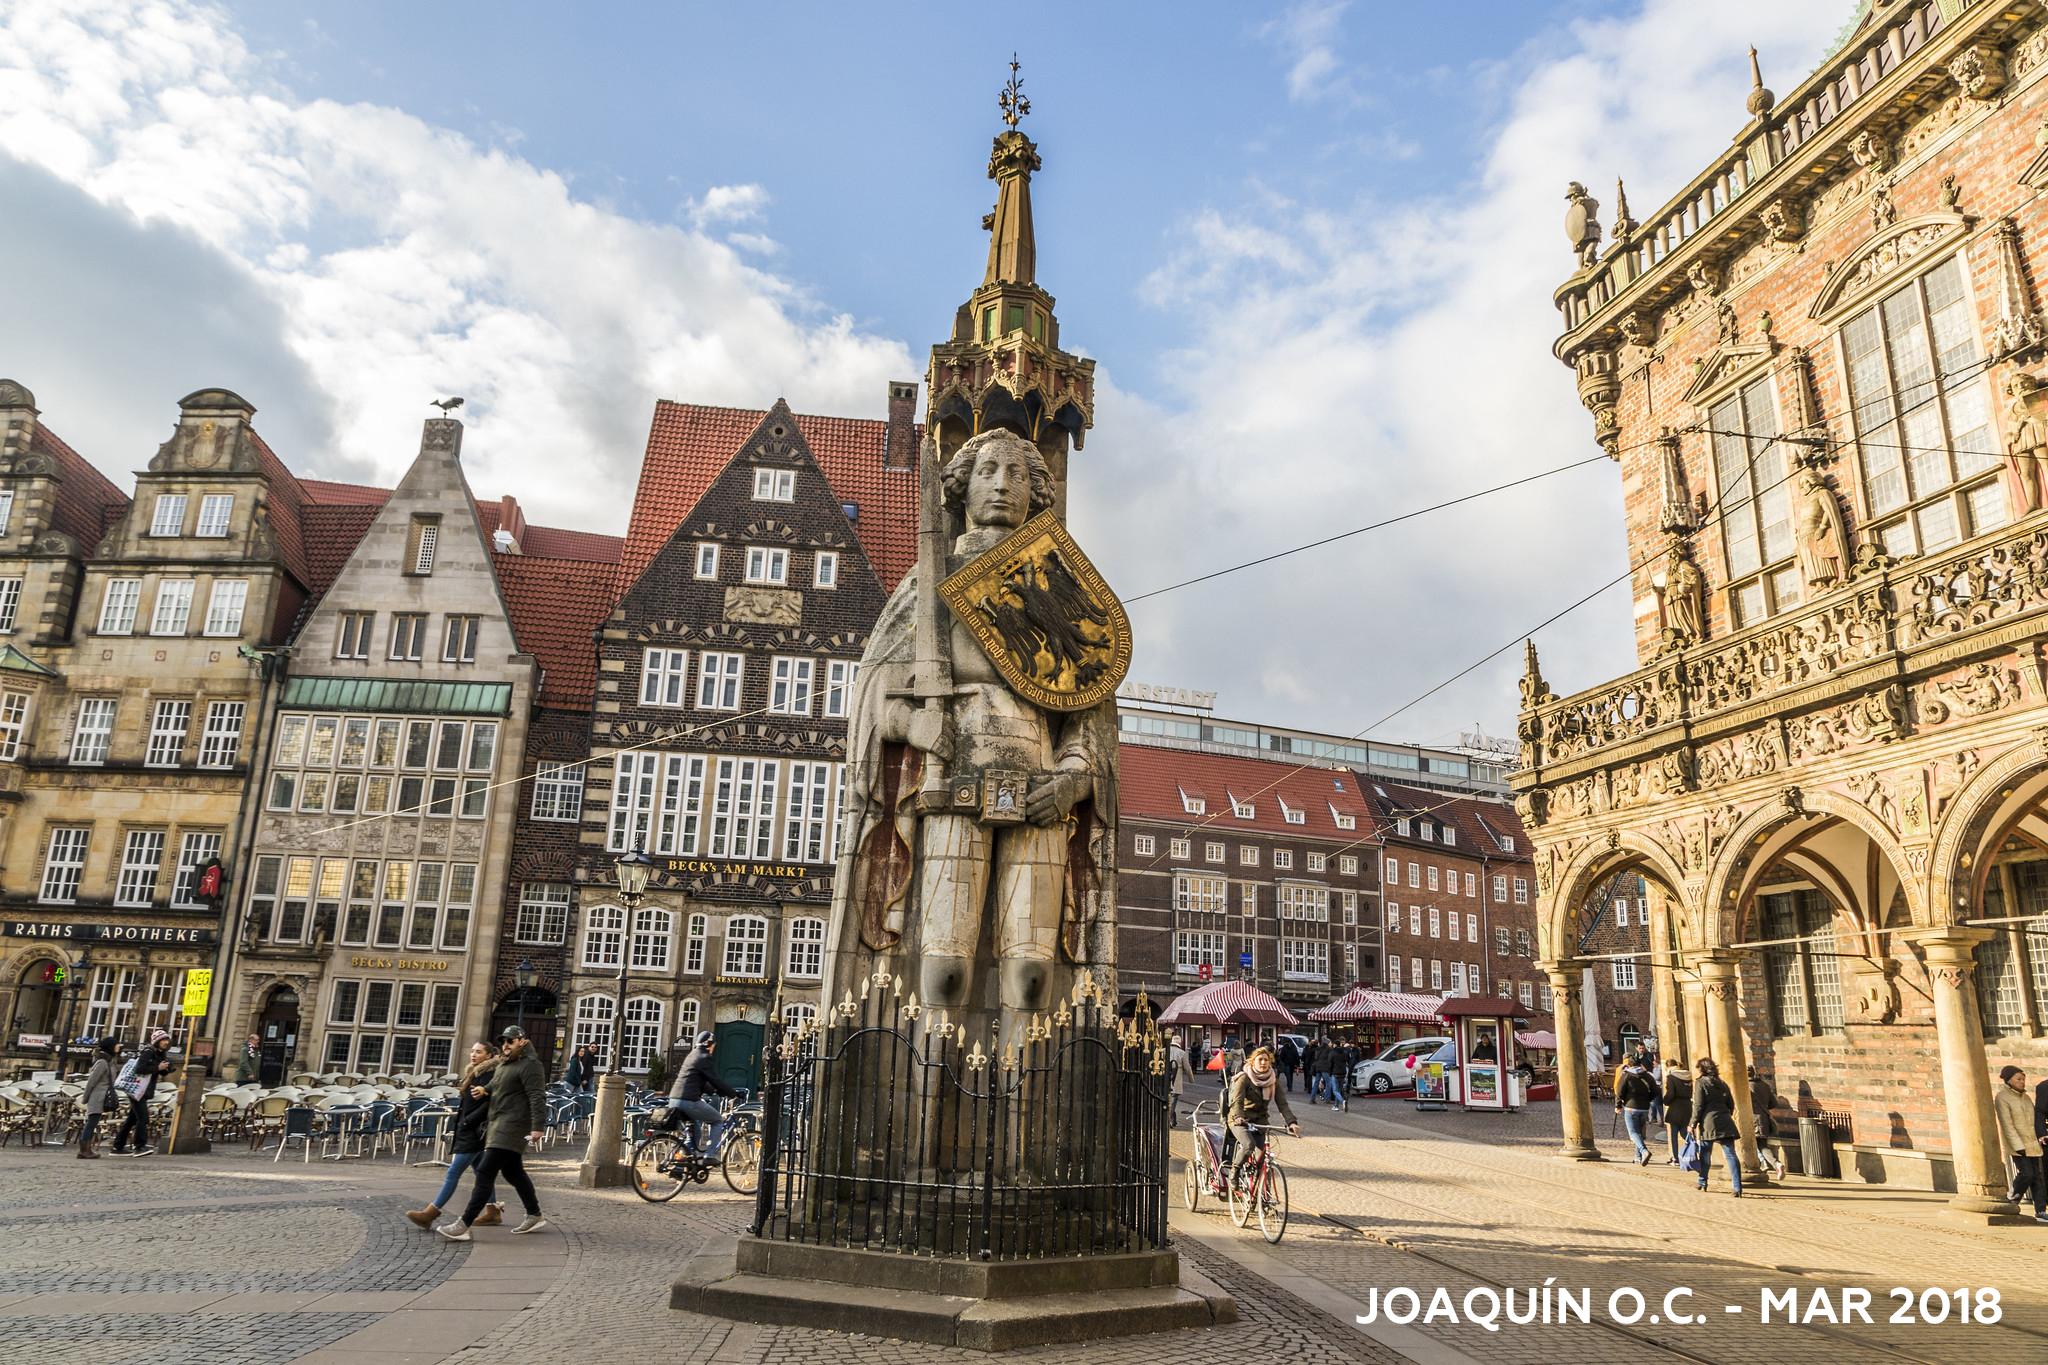 La Estatua De Rolando Símbolo De La Autonomía De Bremen